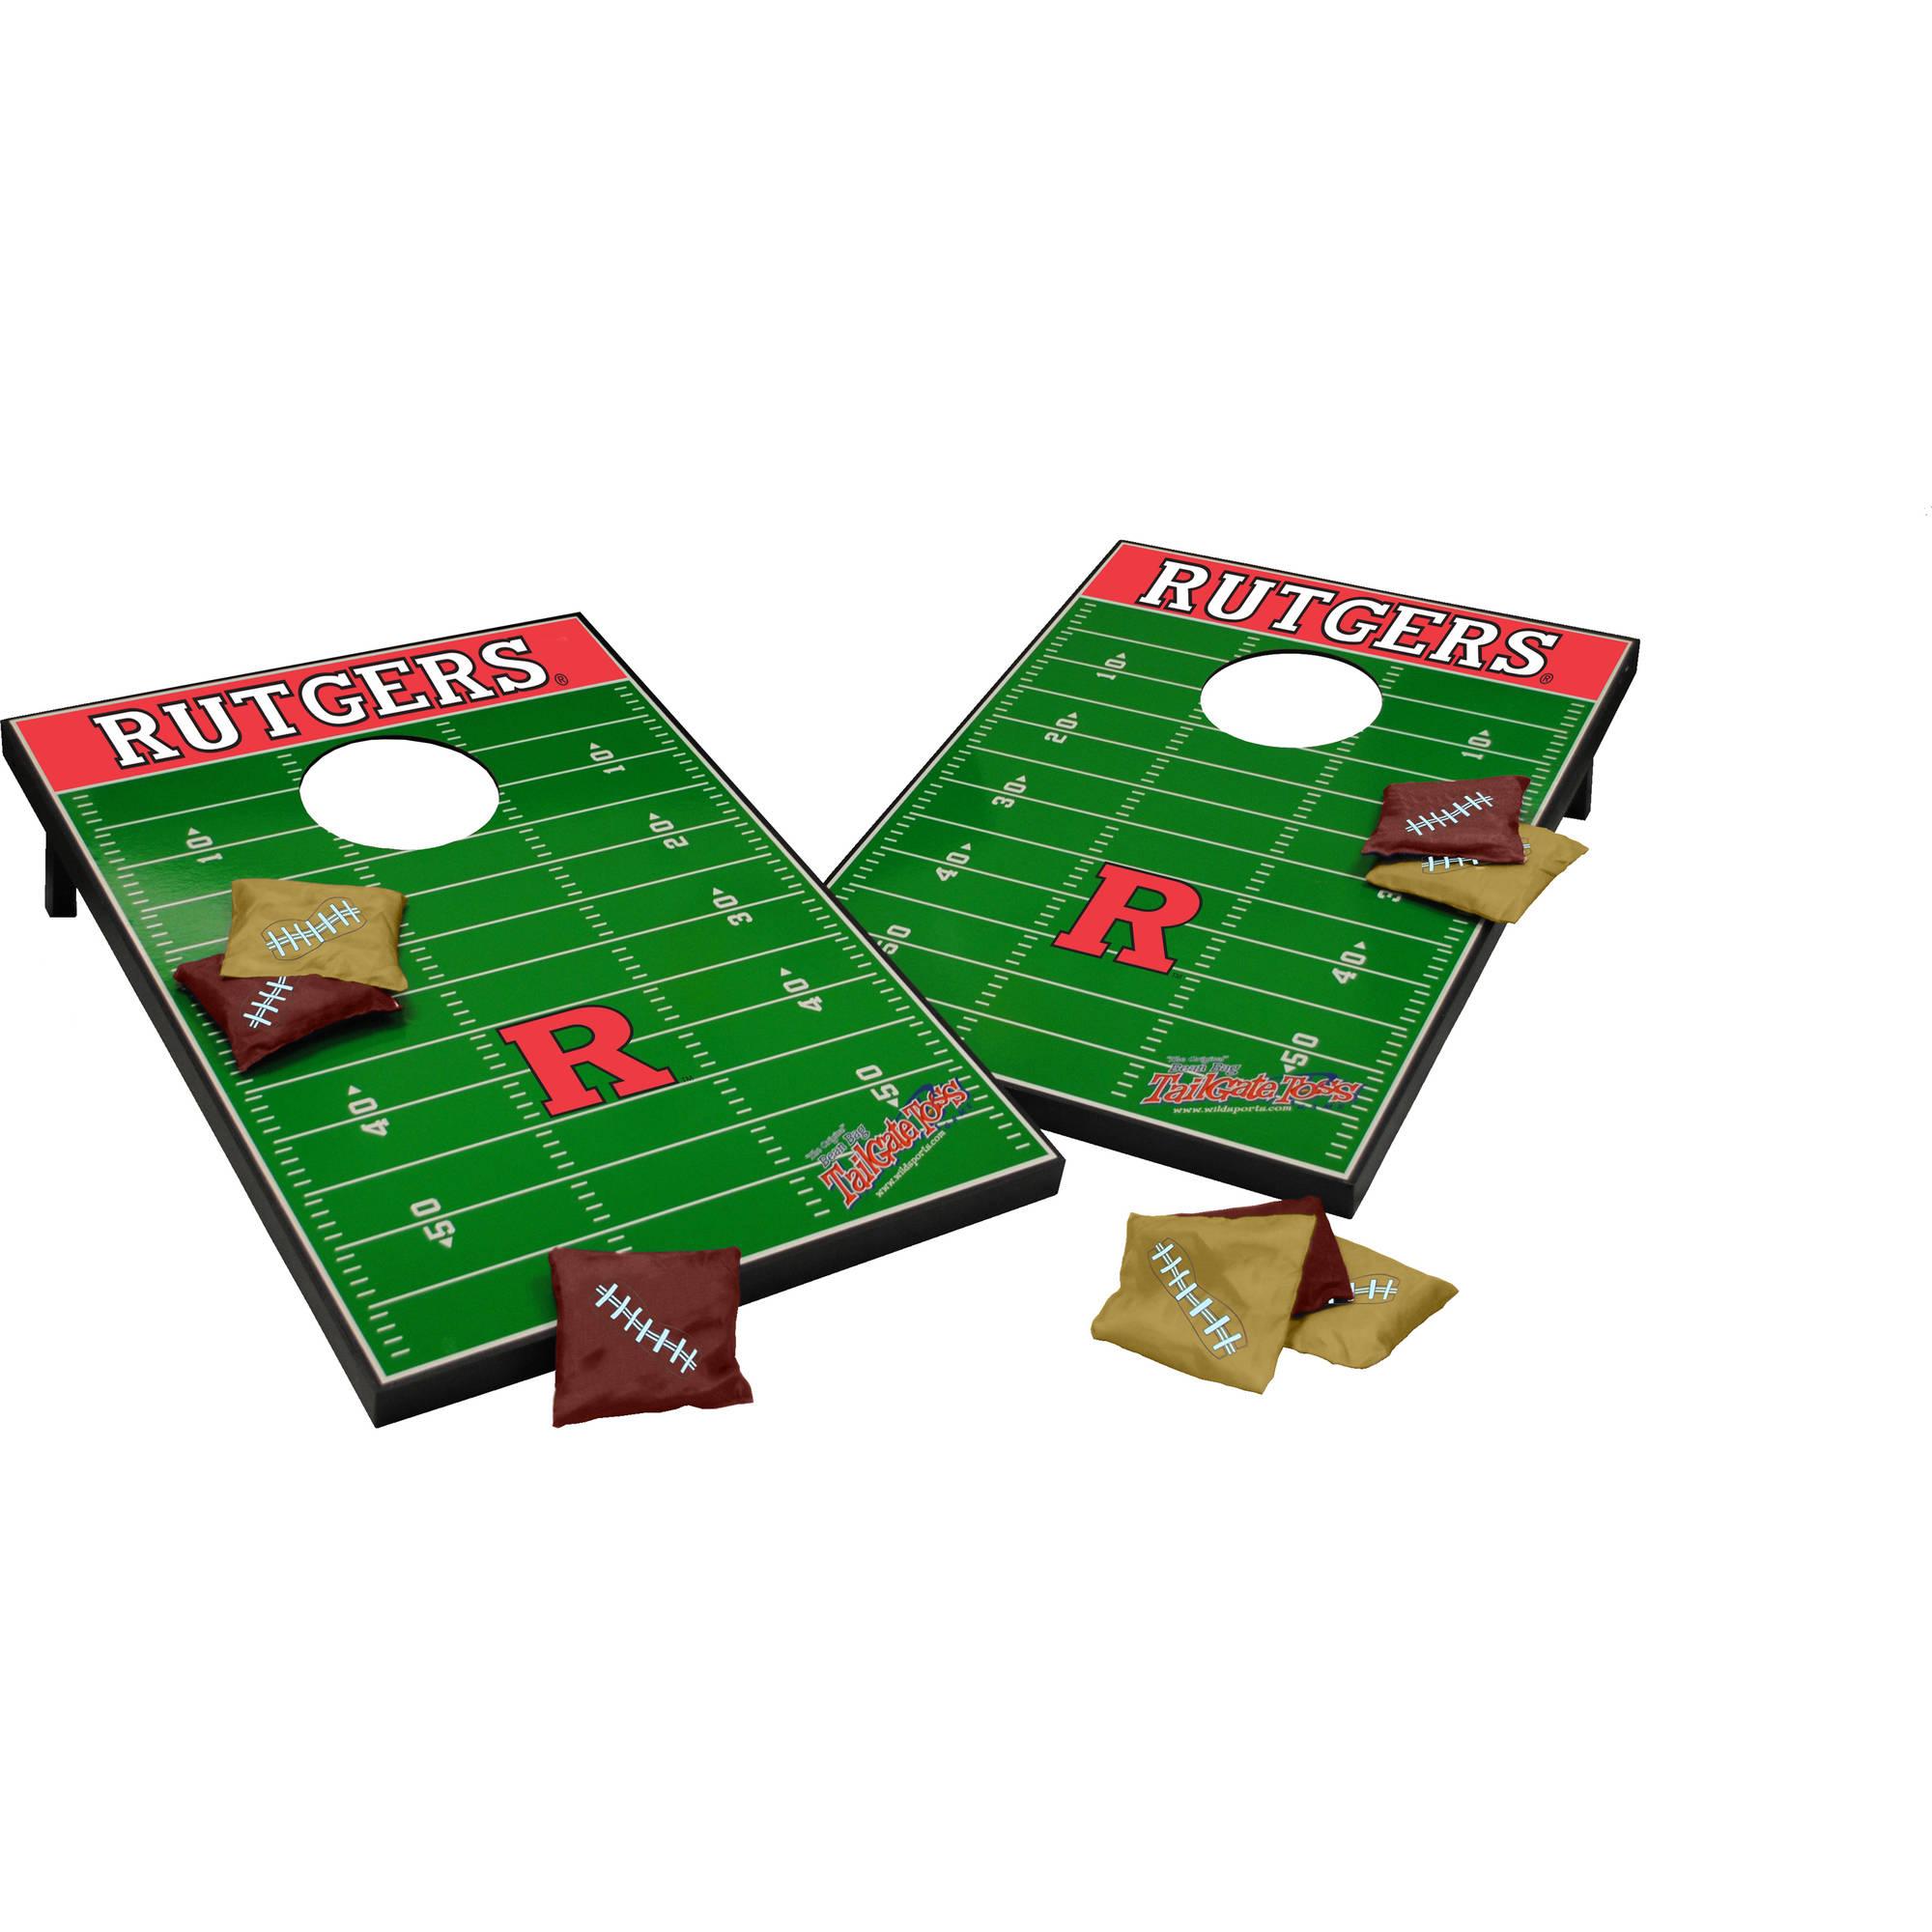 Wild Sports Collegiate Rutgers 2x3 Field Tailgate Toss